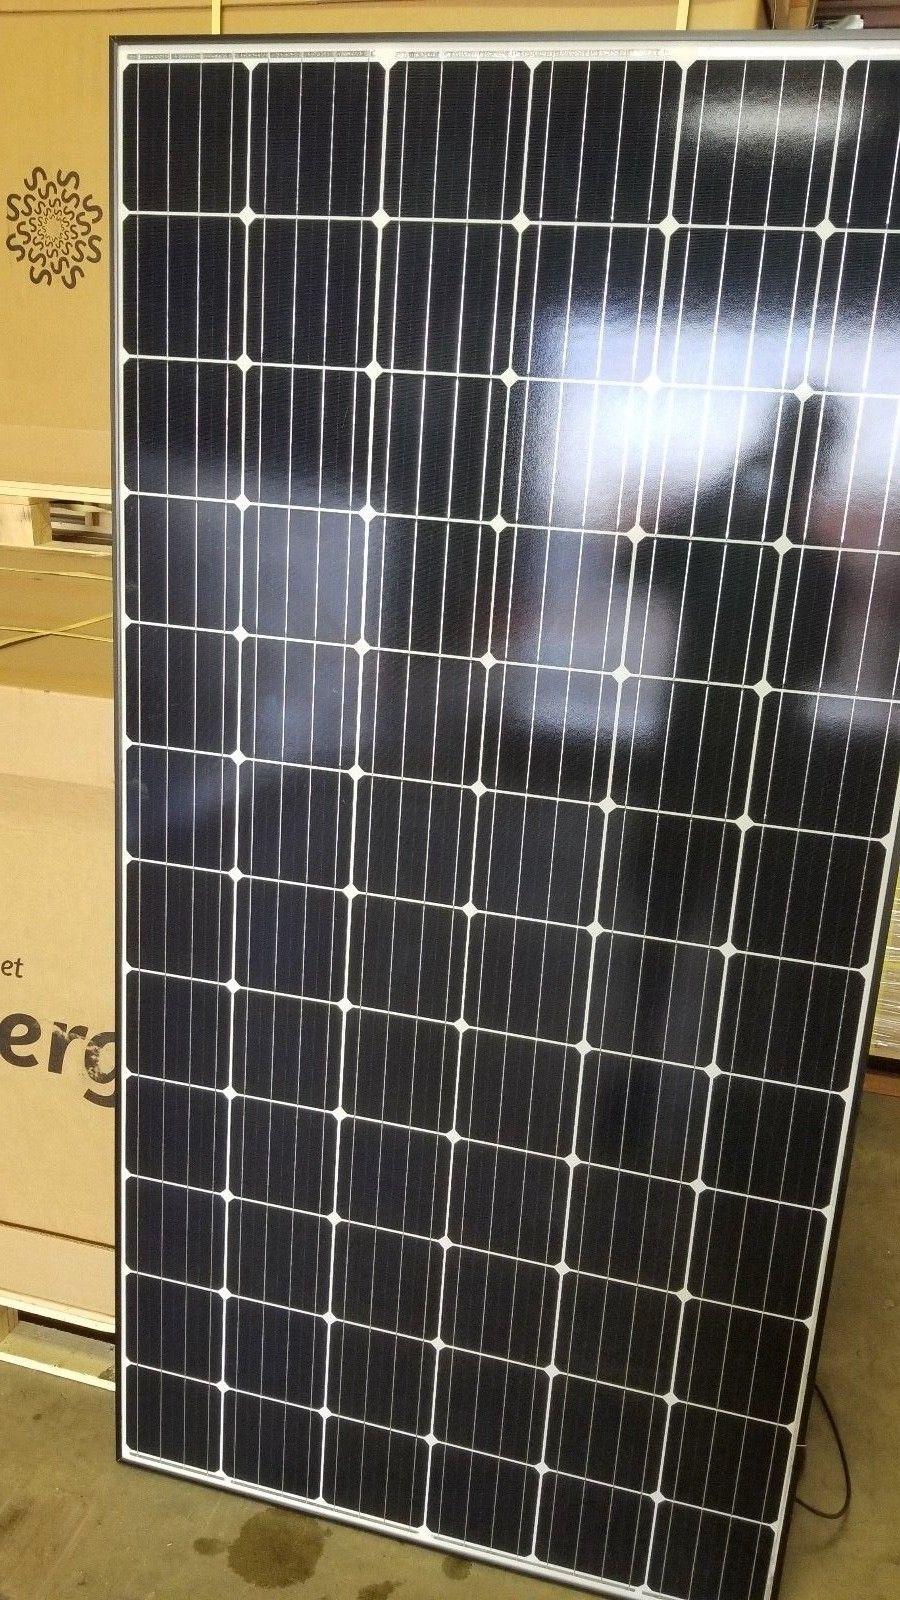 S-ENERGY SOLAR PANNEL, TIGO ENERGY SOLAR PANNEL MAXIMIZER COMPLETE SYSTEM